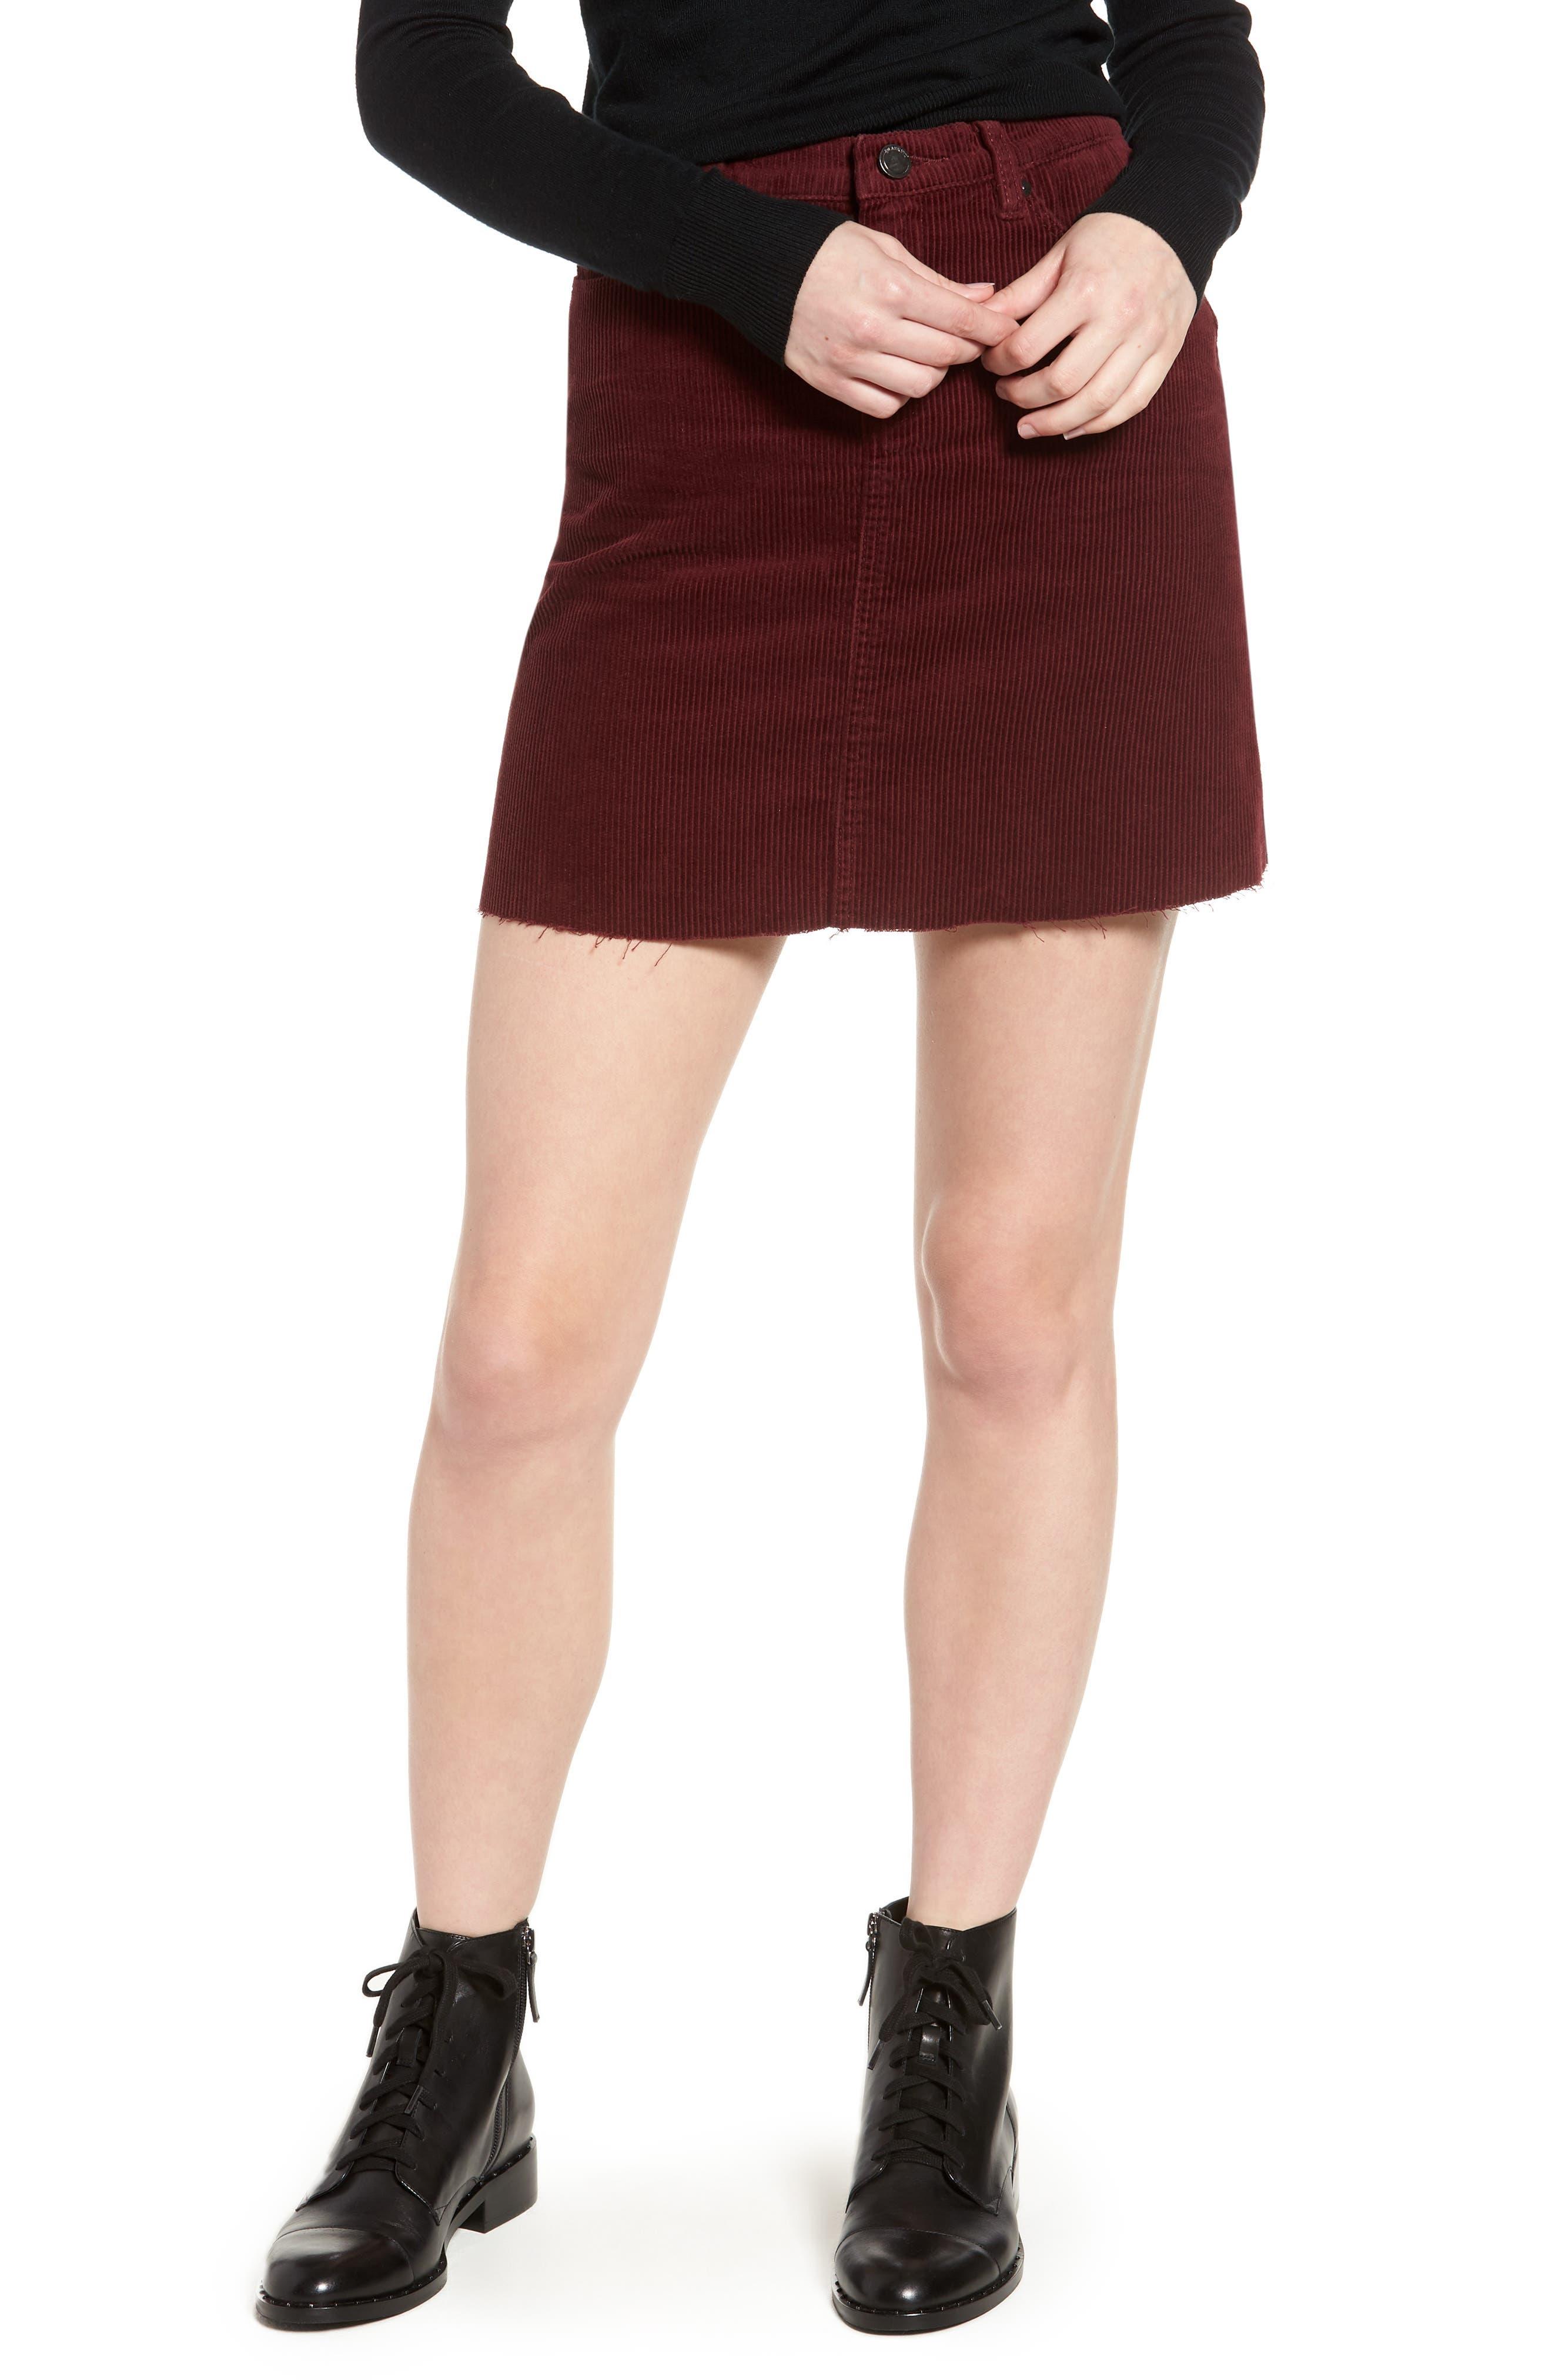 Blanknyc Corduroy A-Line Miniskirt, Burgundy